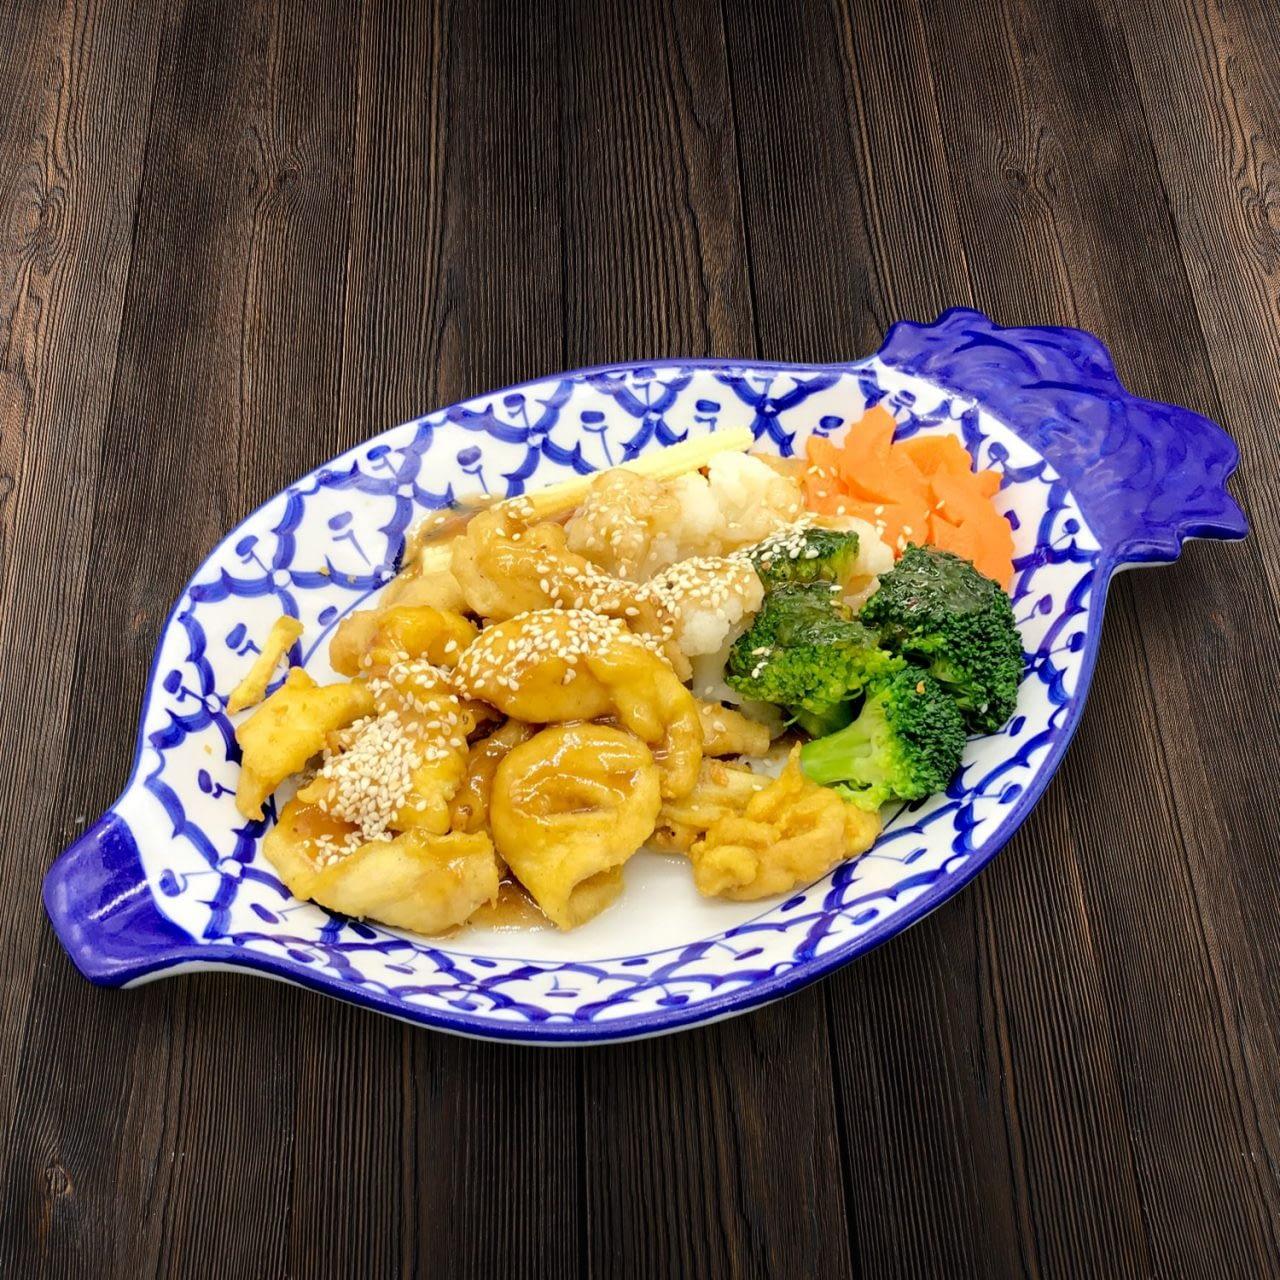 Thai Food Delivery Kuala Lumpur Tamarind Chicken-min